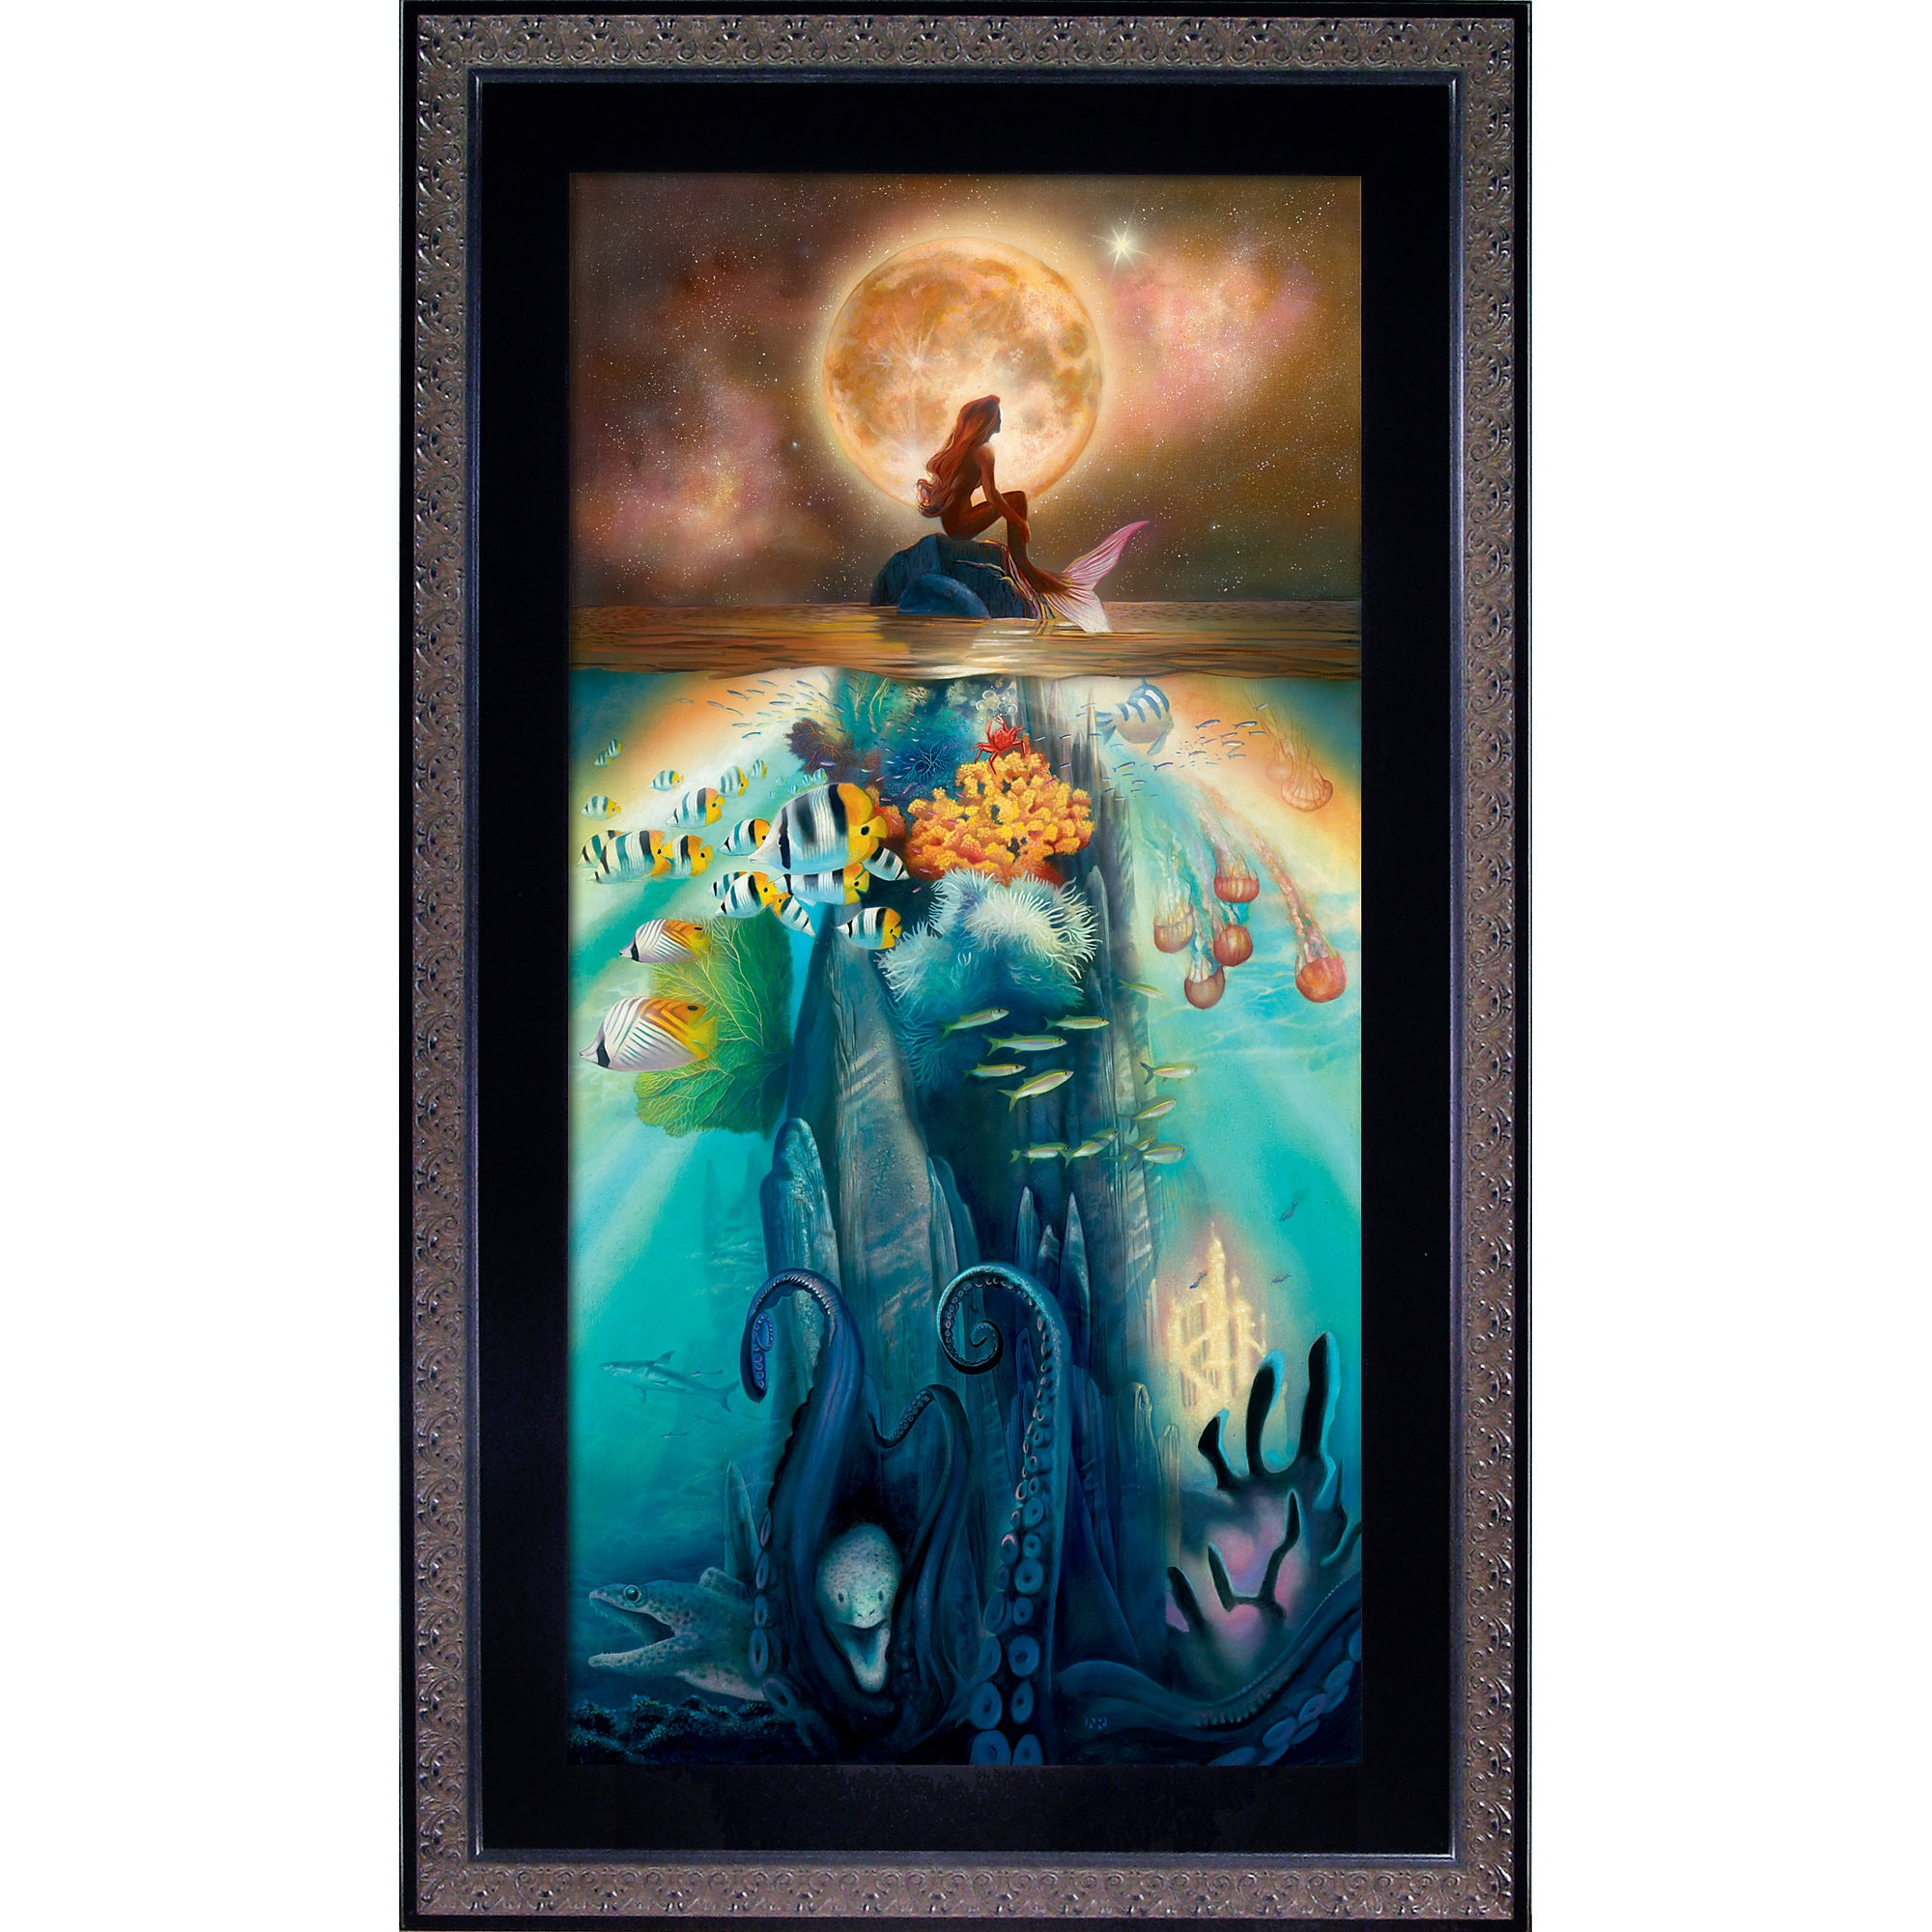 Ariel ''Fathoms Below'' Giclée by John Rowe